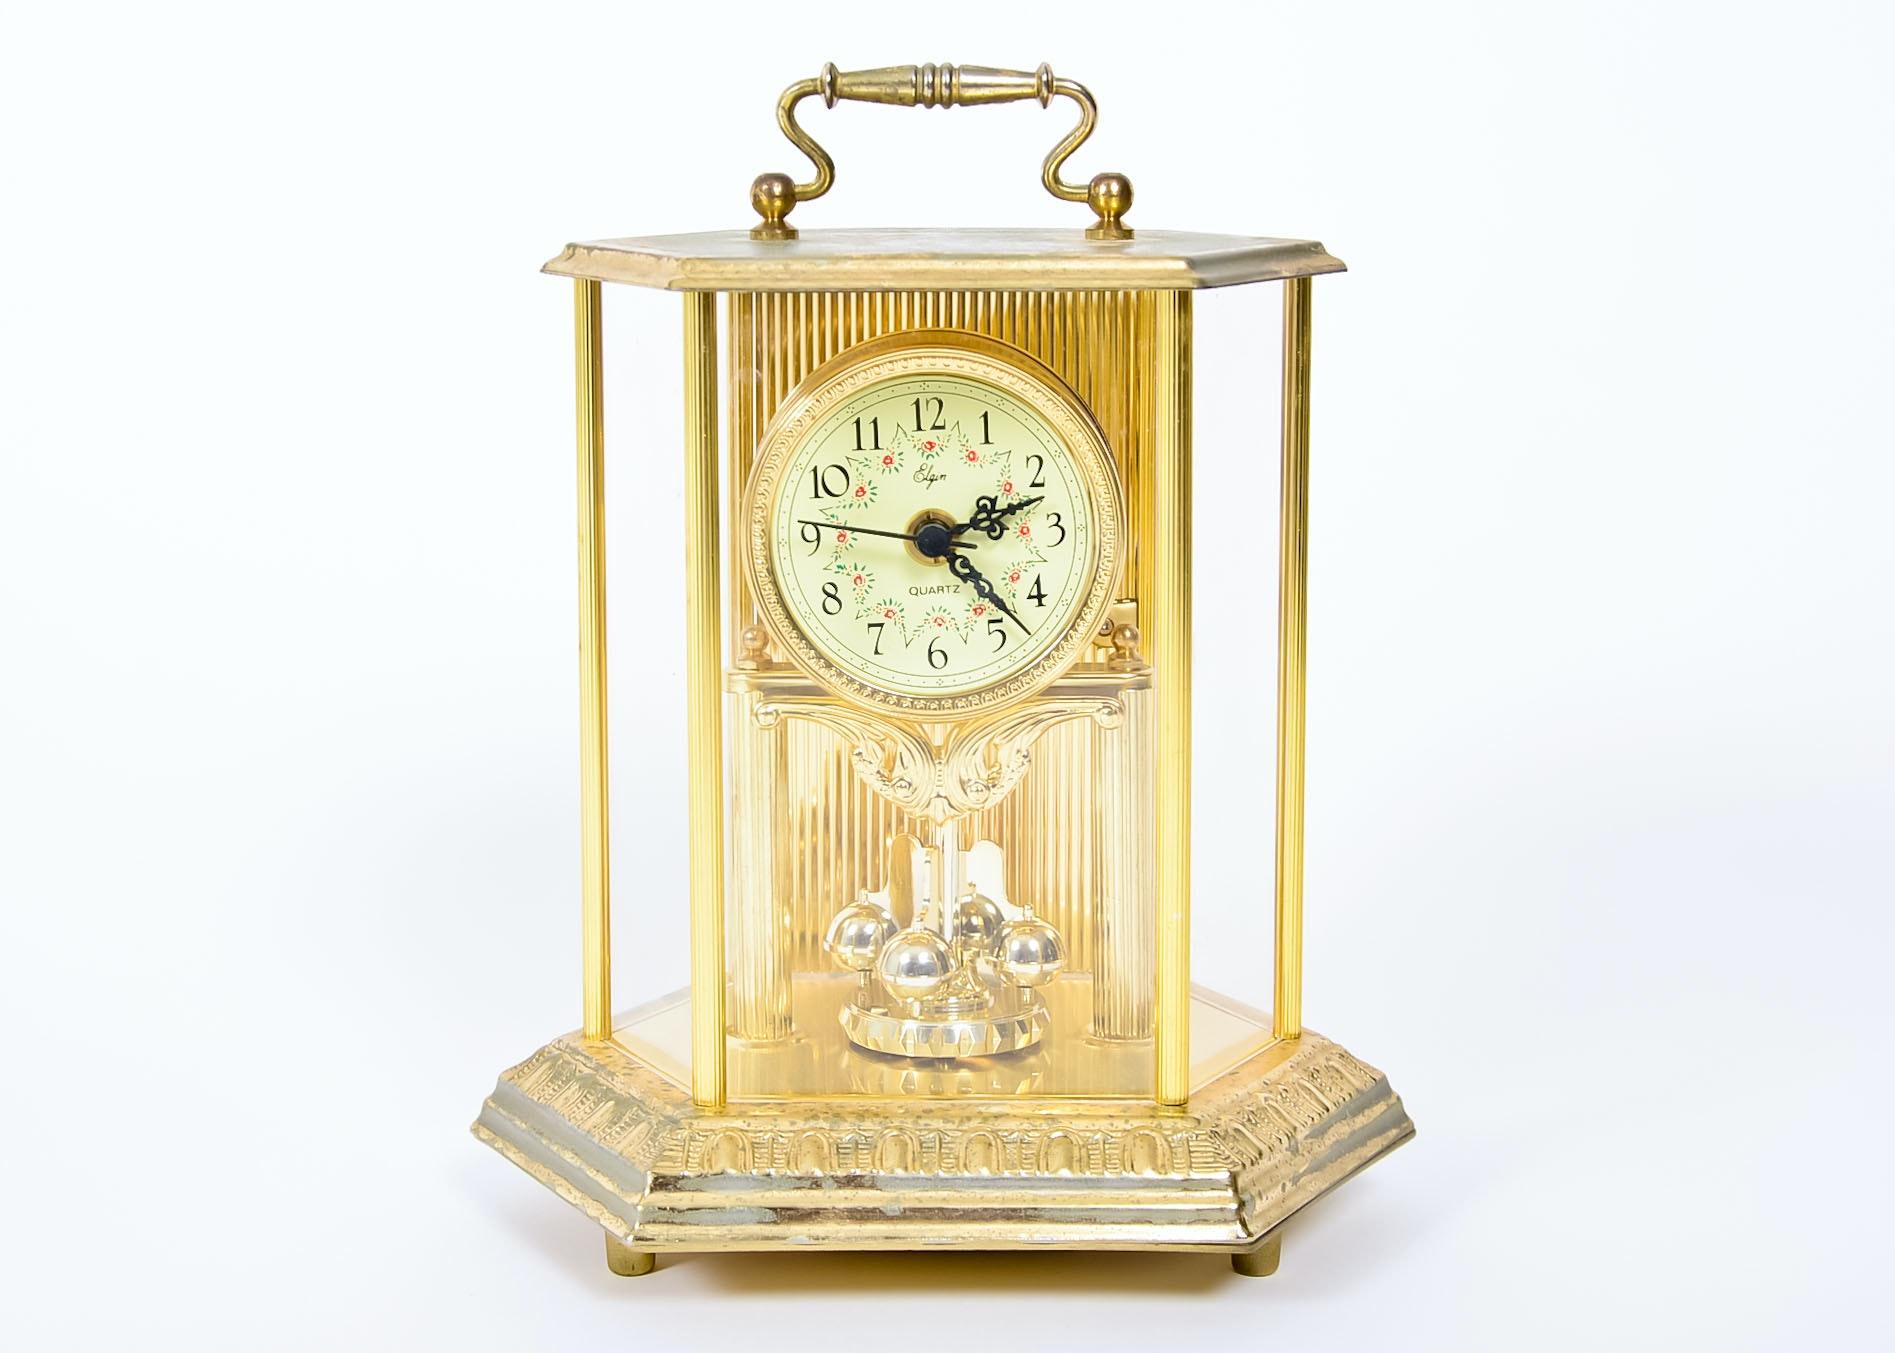 elgin quartz anniversary clock - Anniversary Clock